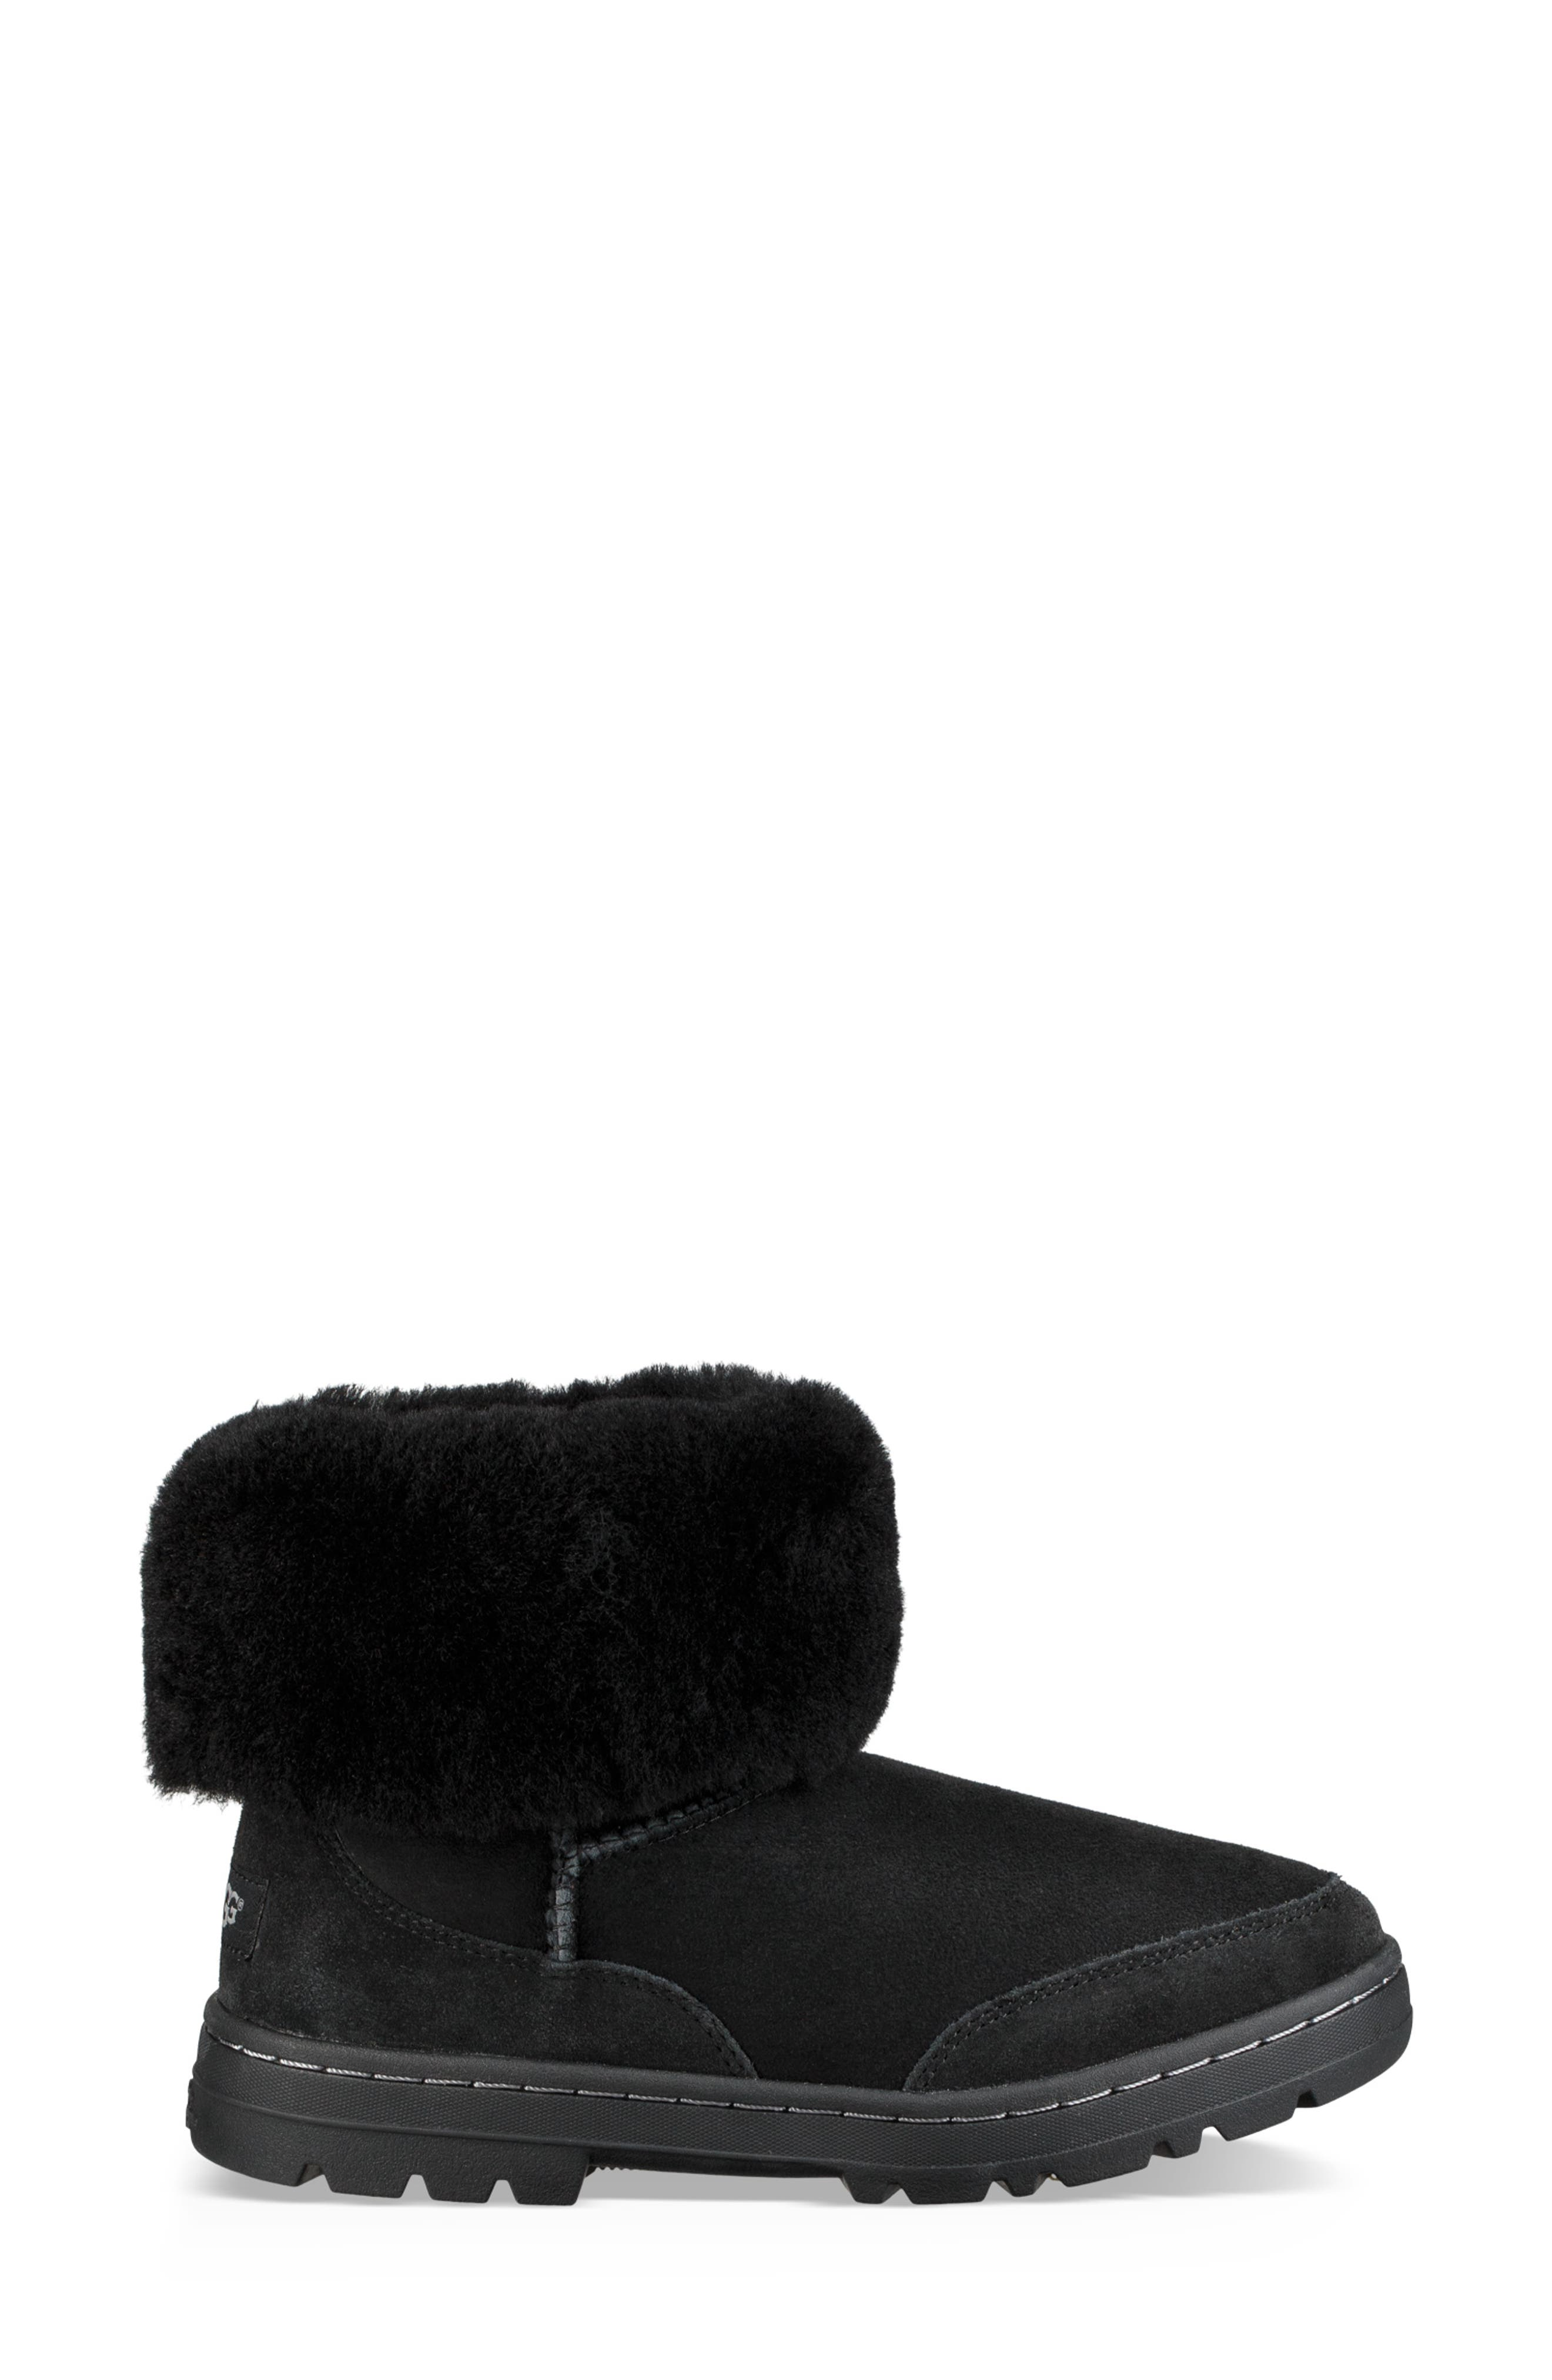 Ultra Revival Genuine Shearling Short Boot,                             Alternate thumbnail 8, color,                             BLACK